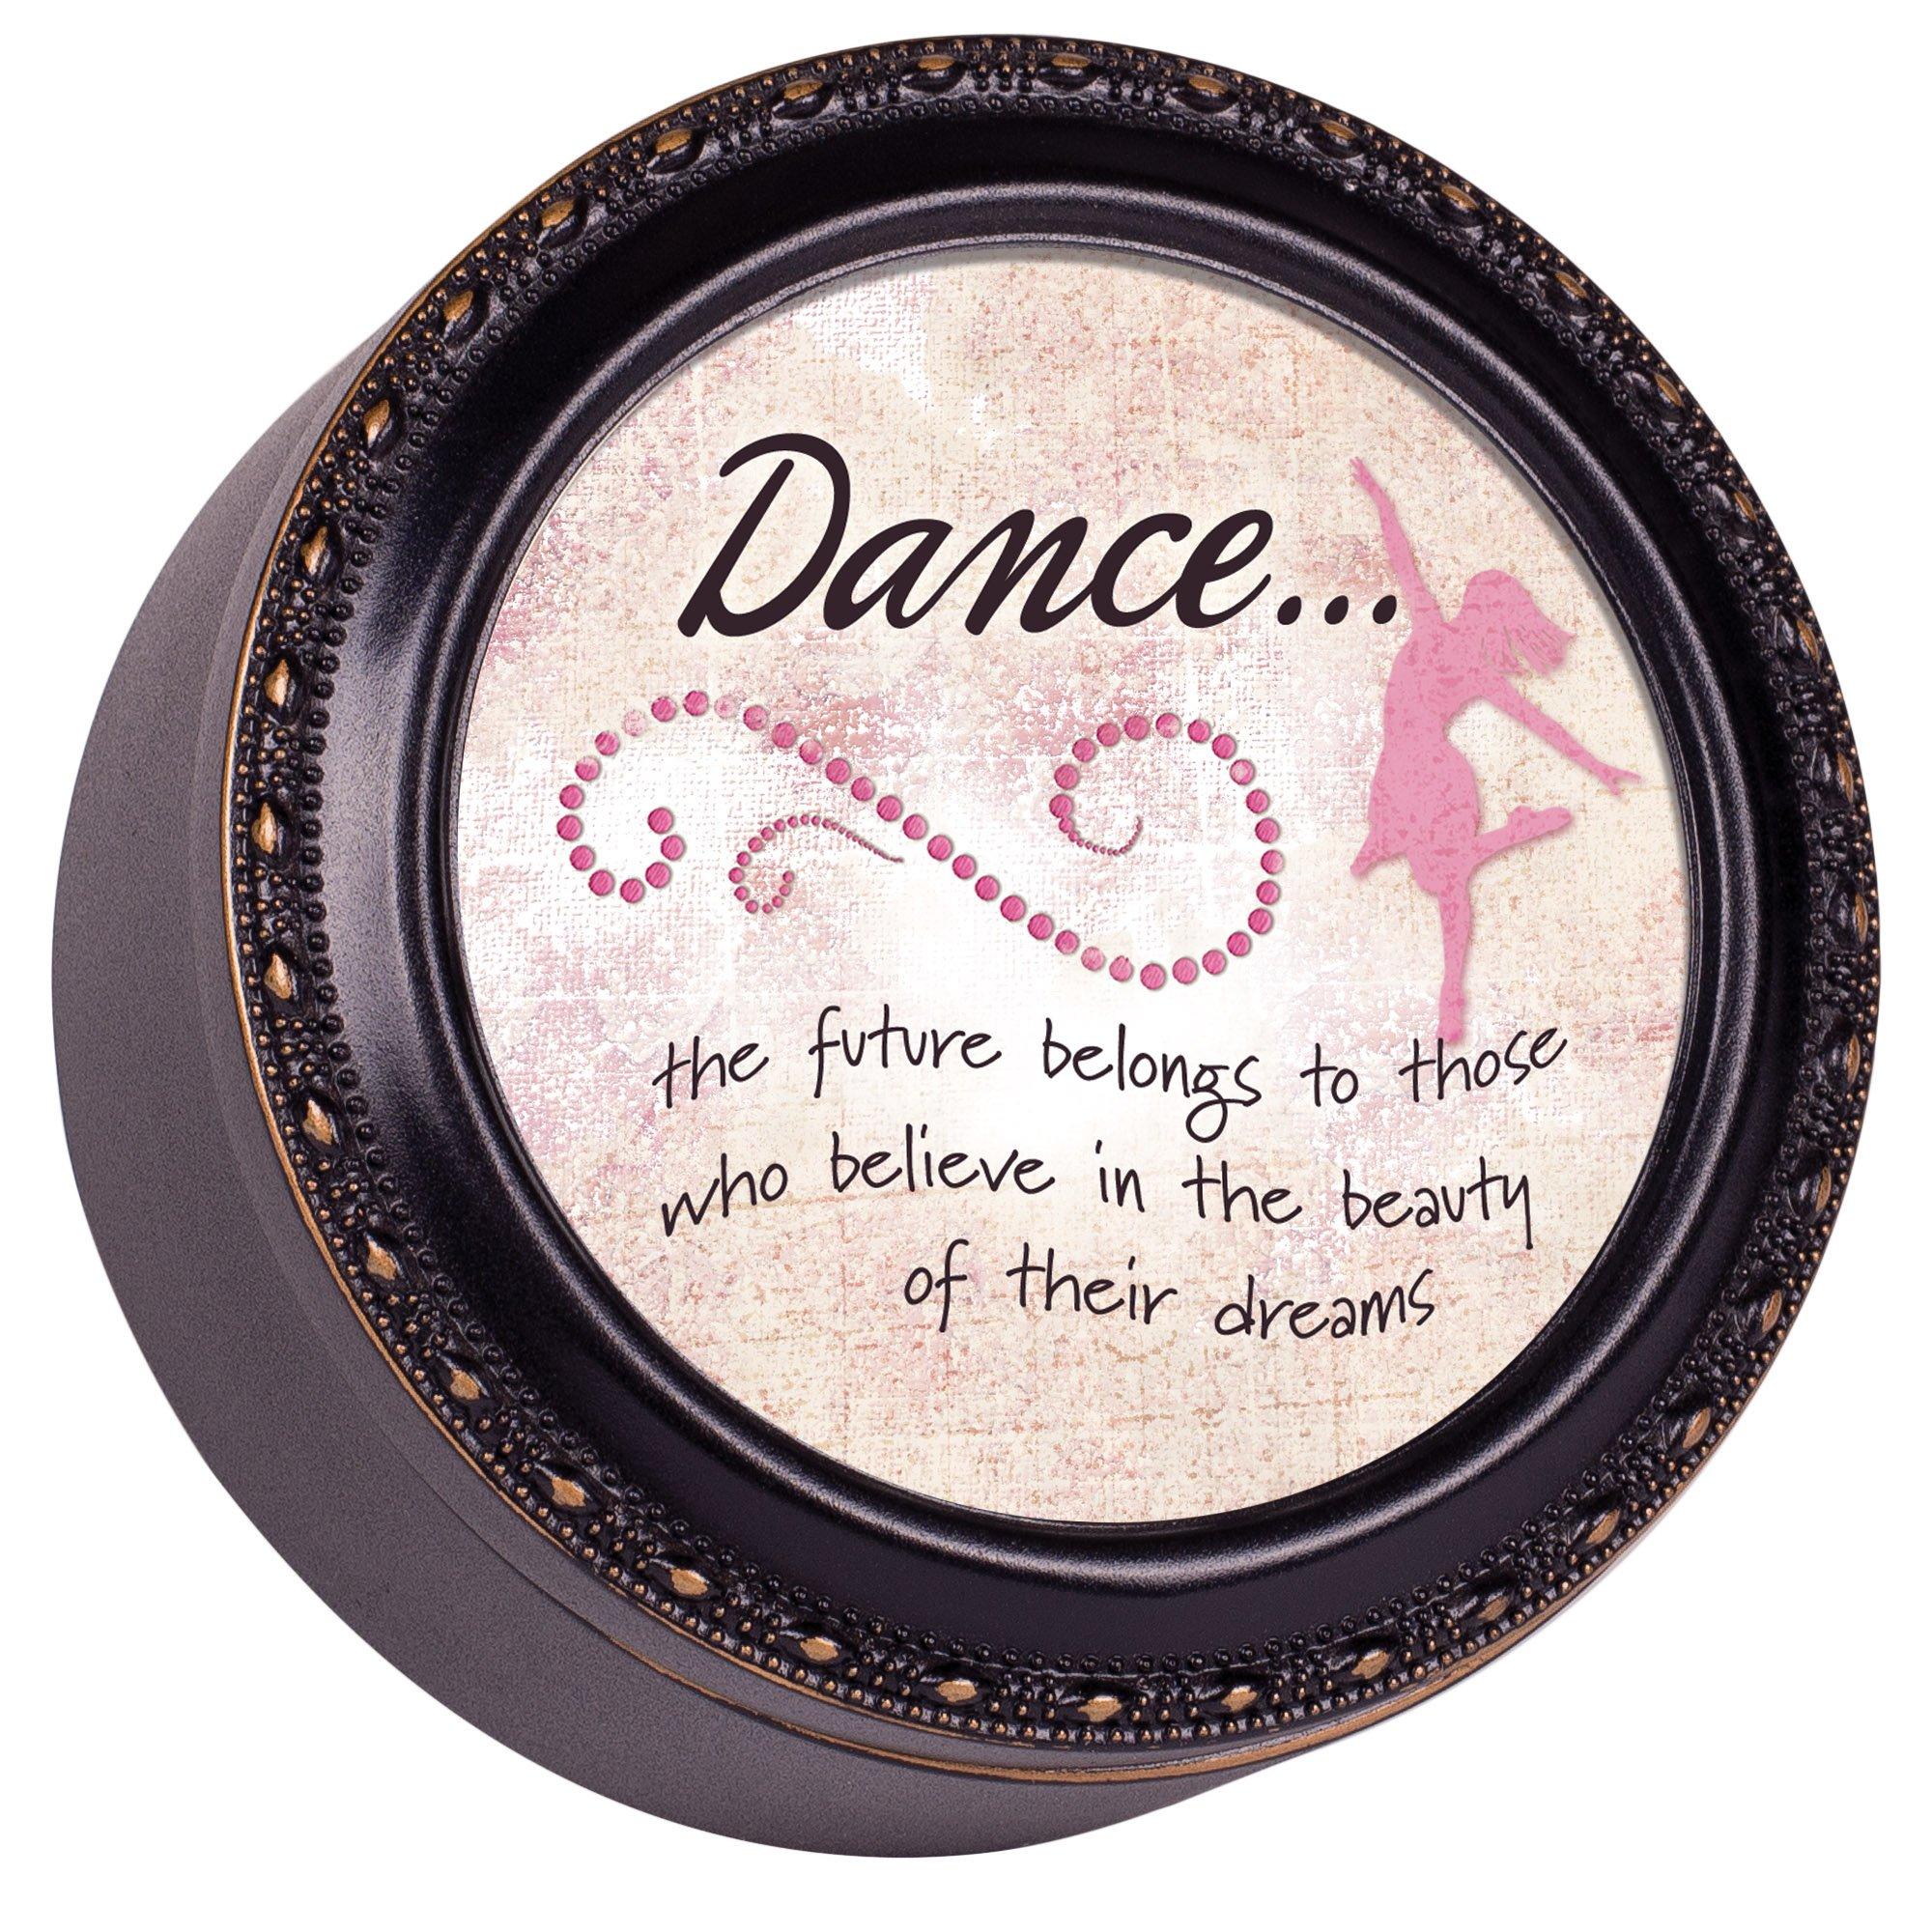 Cottage Garden Dance Distressed Black Tiny Round Treasure Box